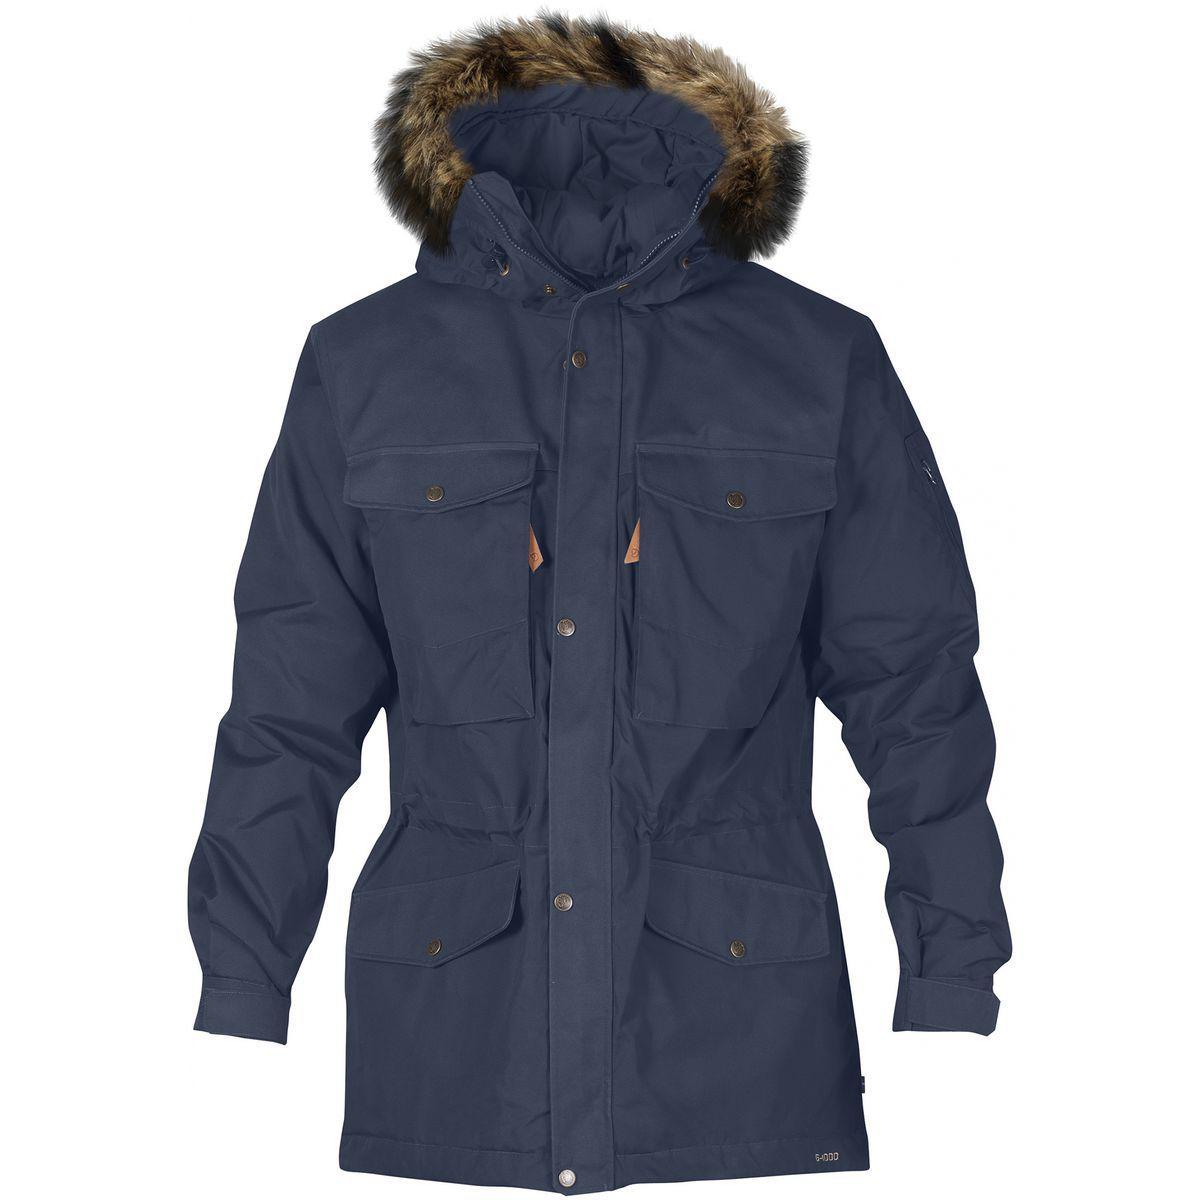 b6c96cfe5db Lyst - Fjallraven Singi Winter Insulated Jacket in Blue for Men ...